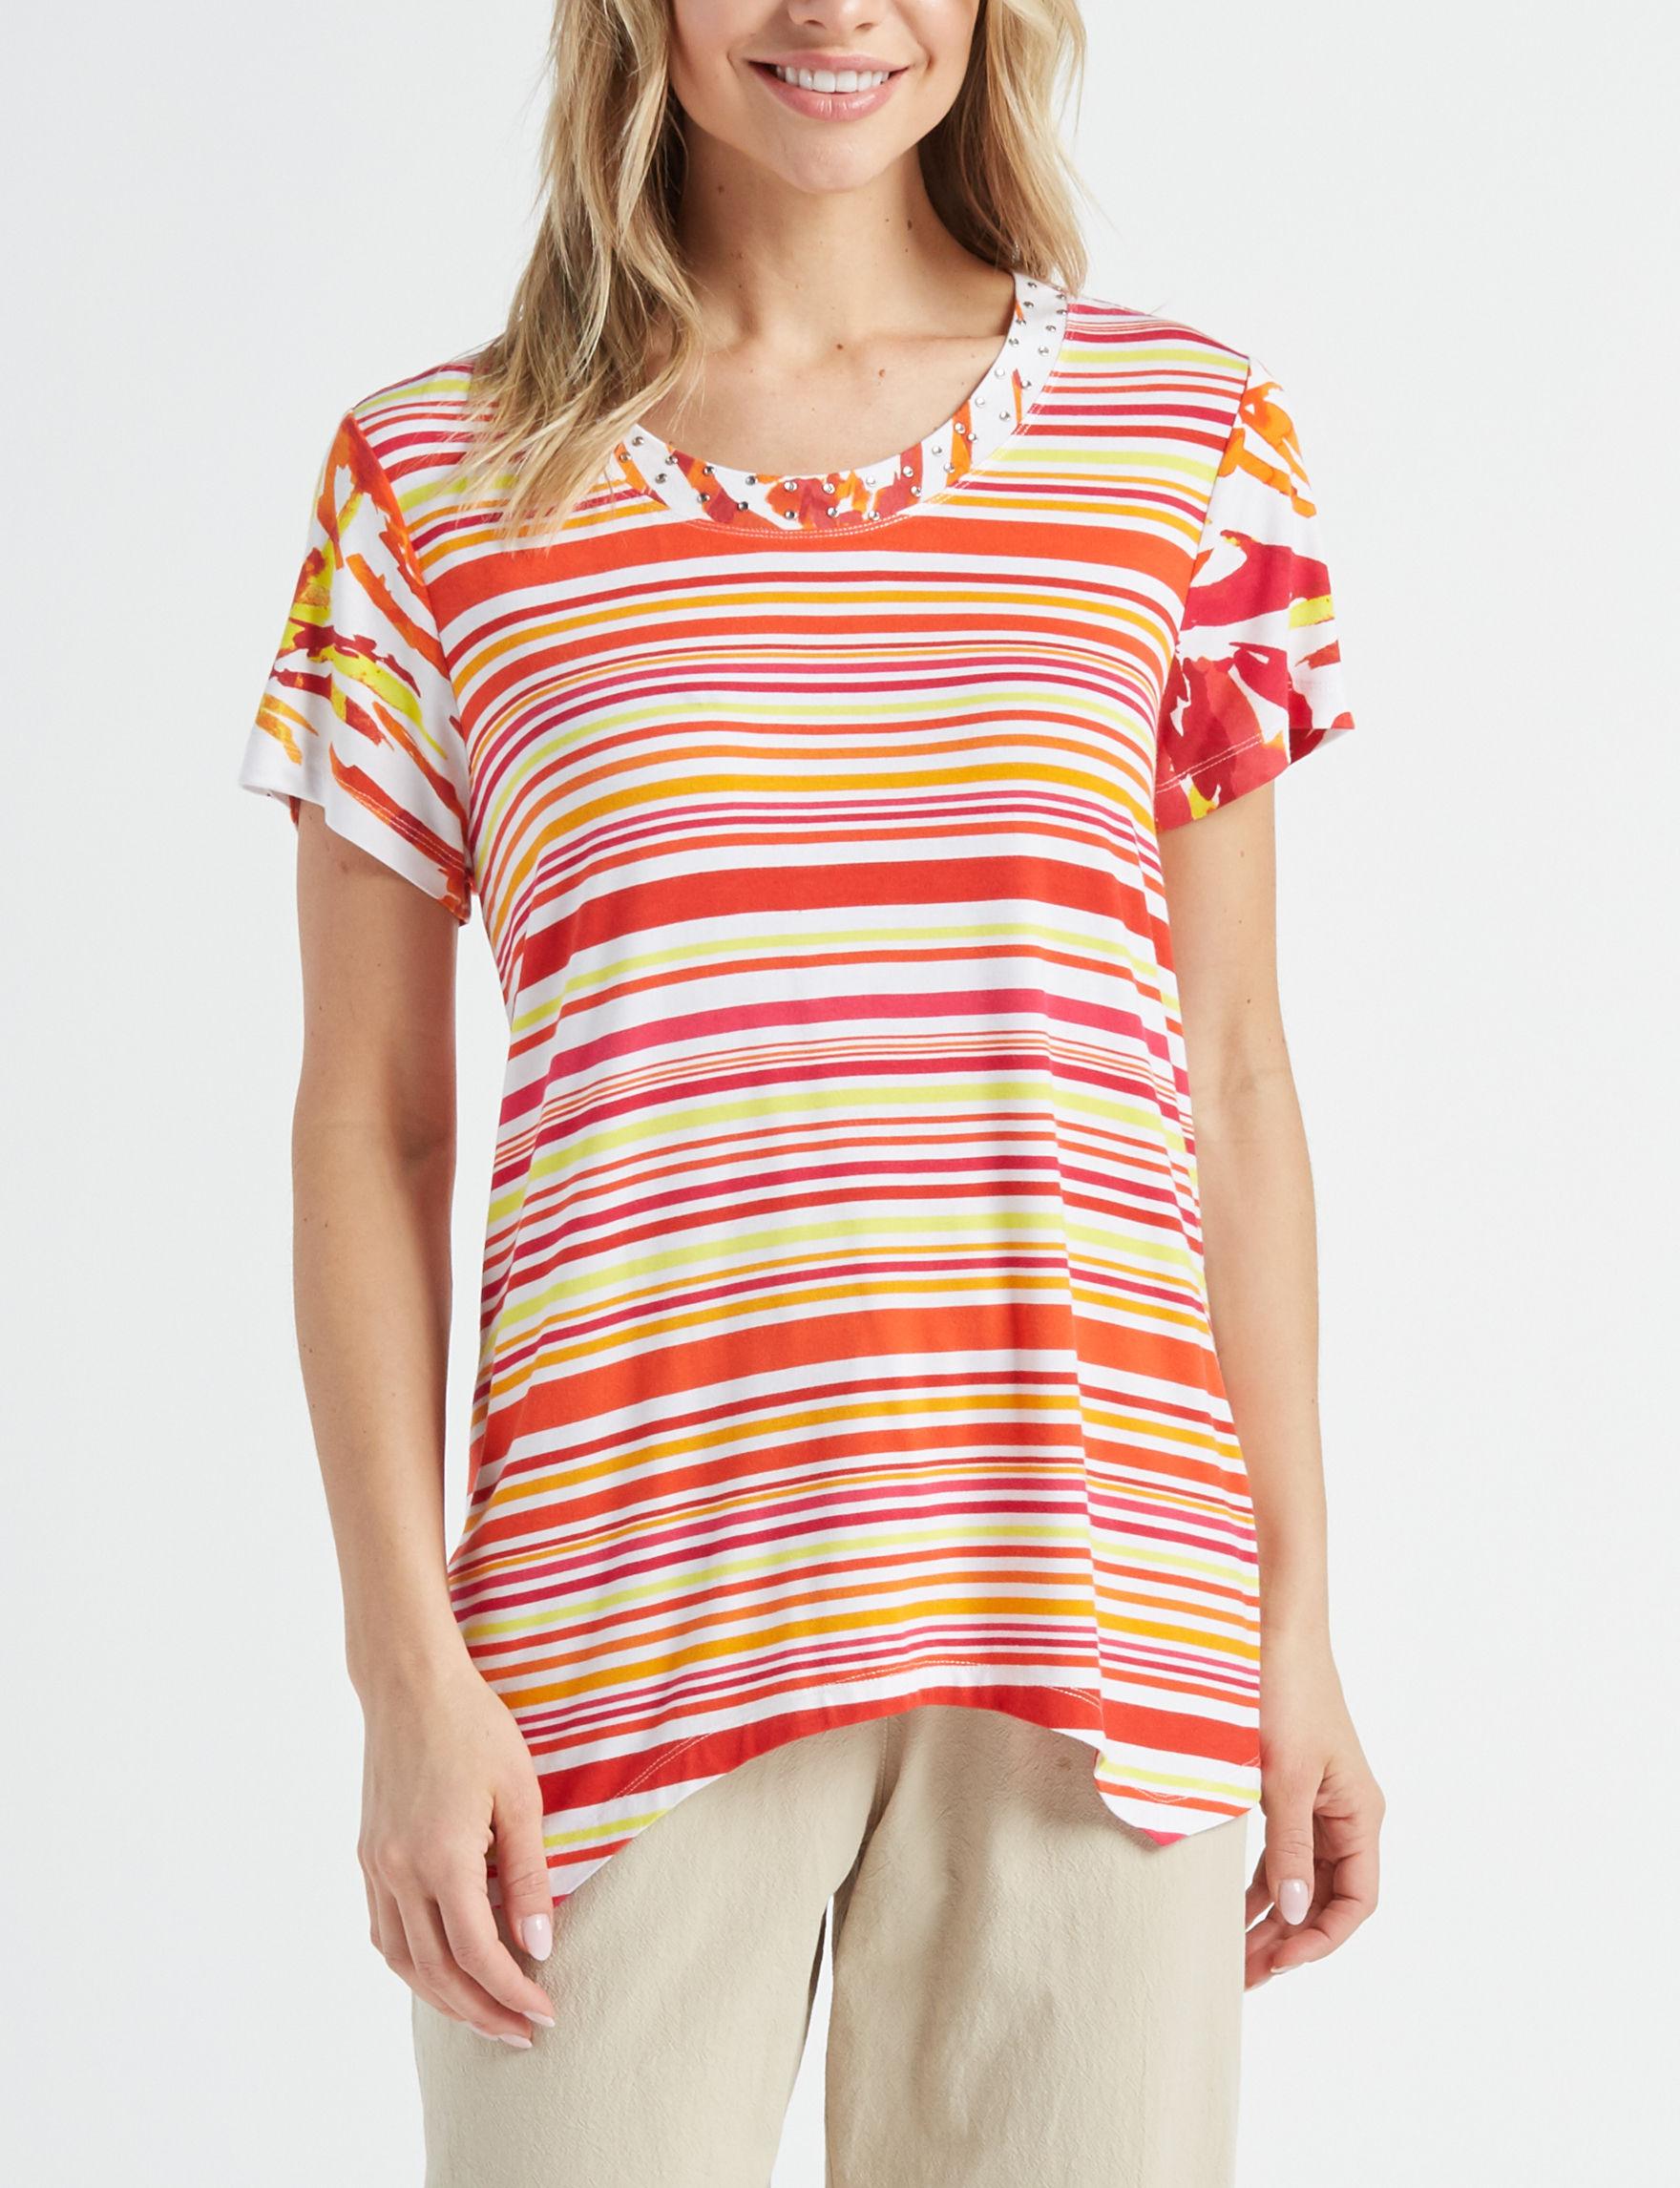 Rebecca Malone White / Red Shirts & Blouses Tees & Tanks